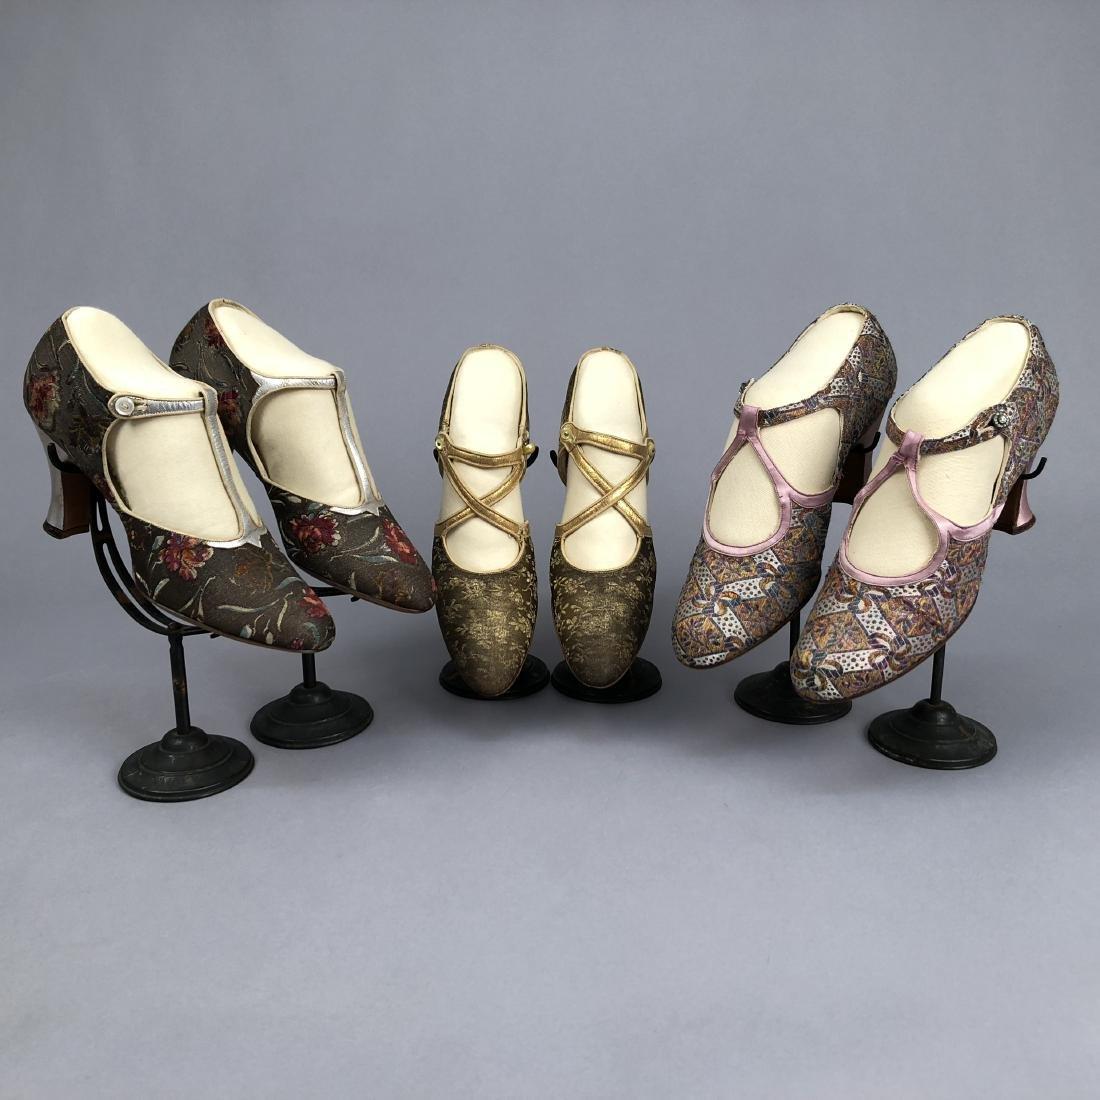 THREE PAIR METALLIC and BROCADE PUMPS, c. 1925